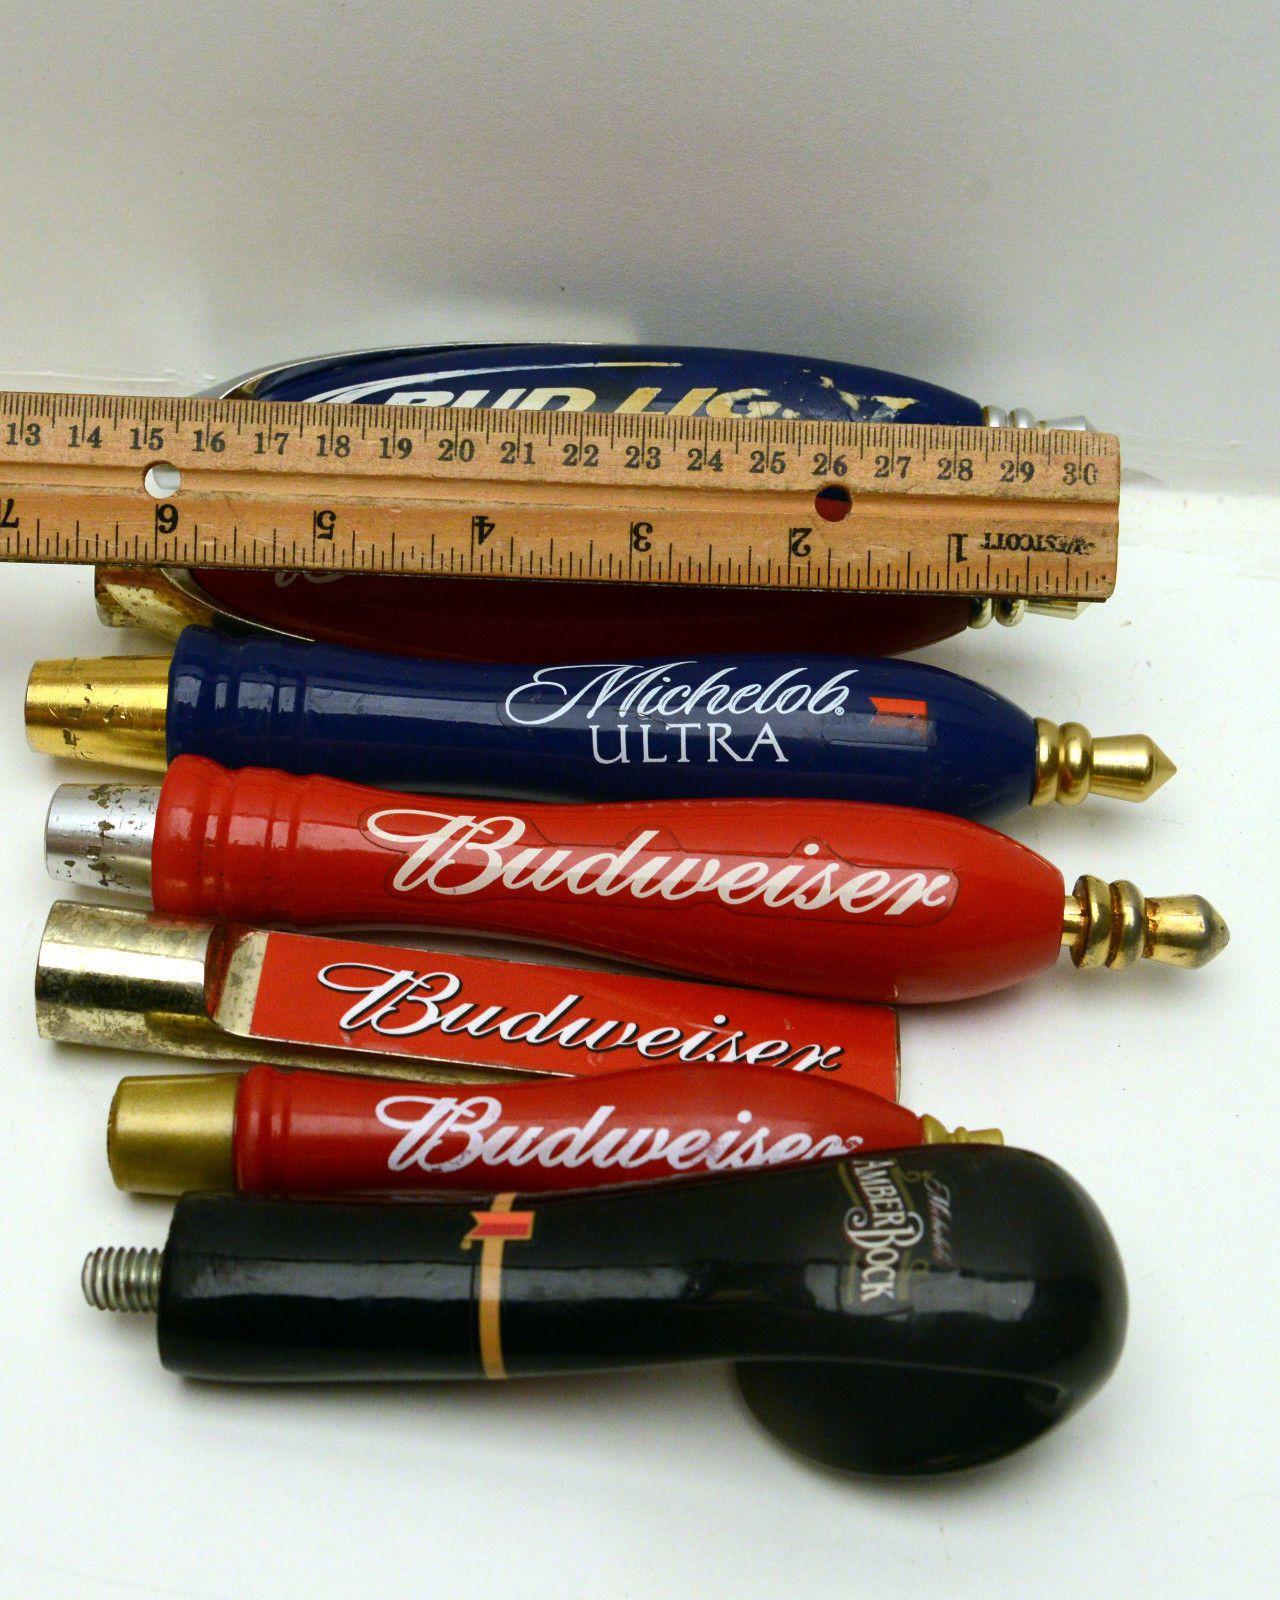 Bud Light Budweiser Michelob Amber Bock Beer Tap Lot Mini S Lot Of